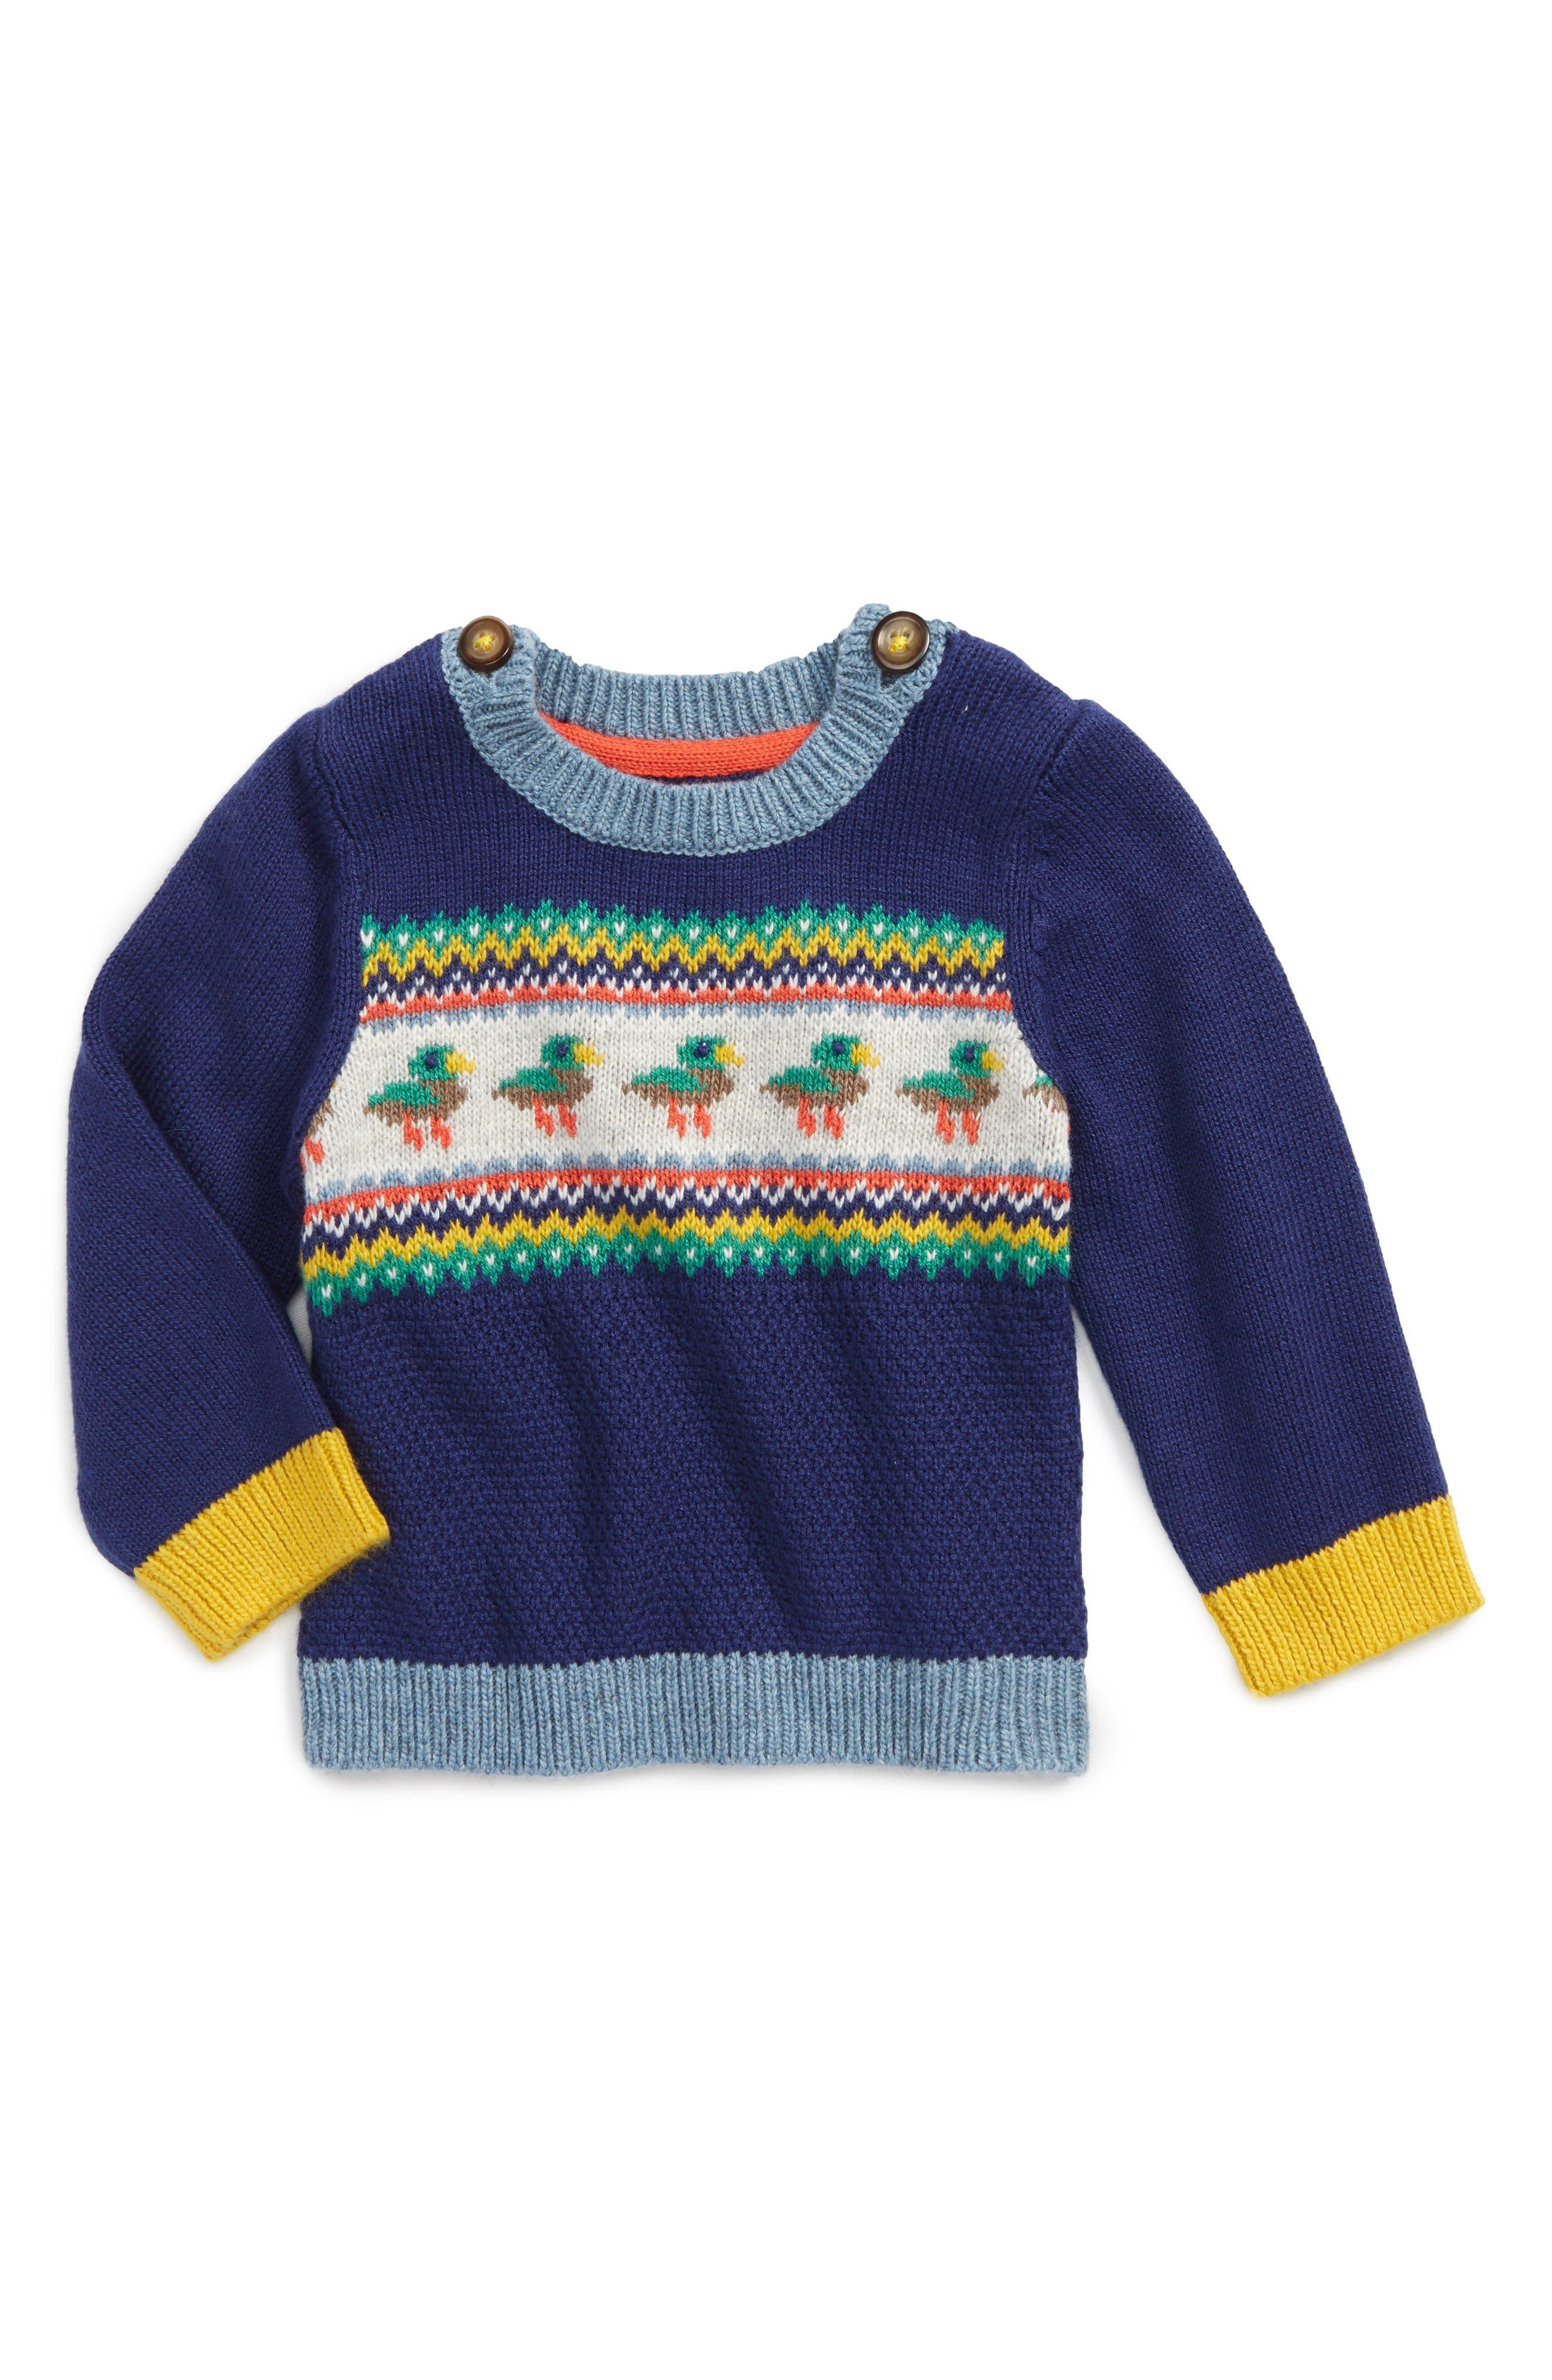 Fun Knit Sweater,                         Main,                         color, Beacon Blue Ducks